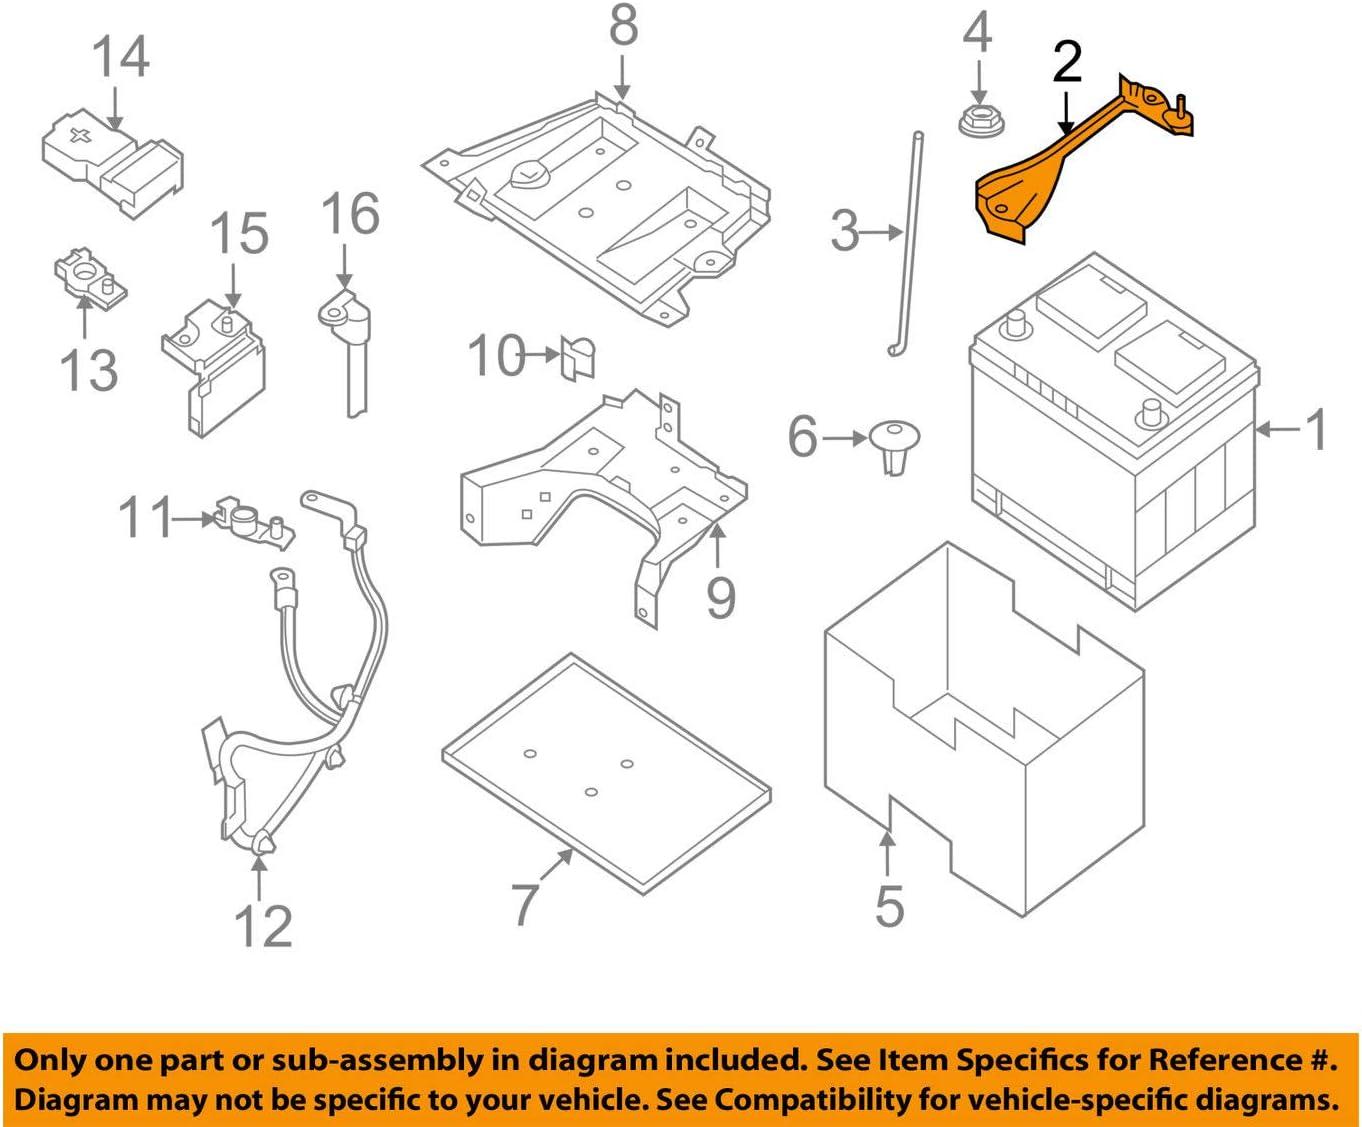 amazon.com: genuine nissan parts - battery frame (24420-zx60a), regular:  automotive  amazon.com